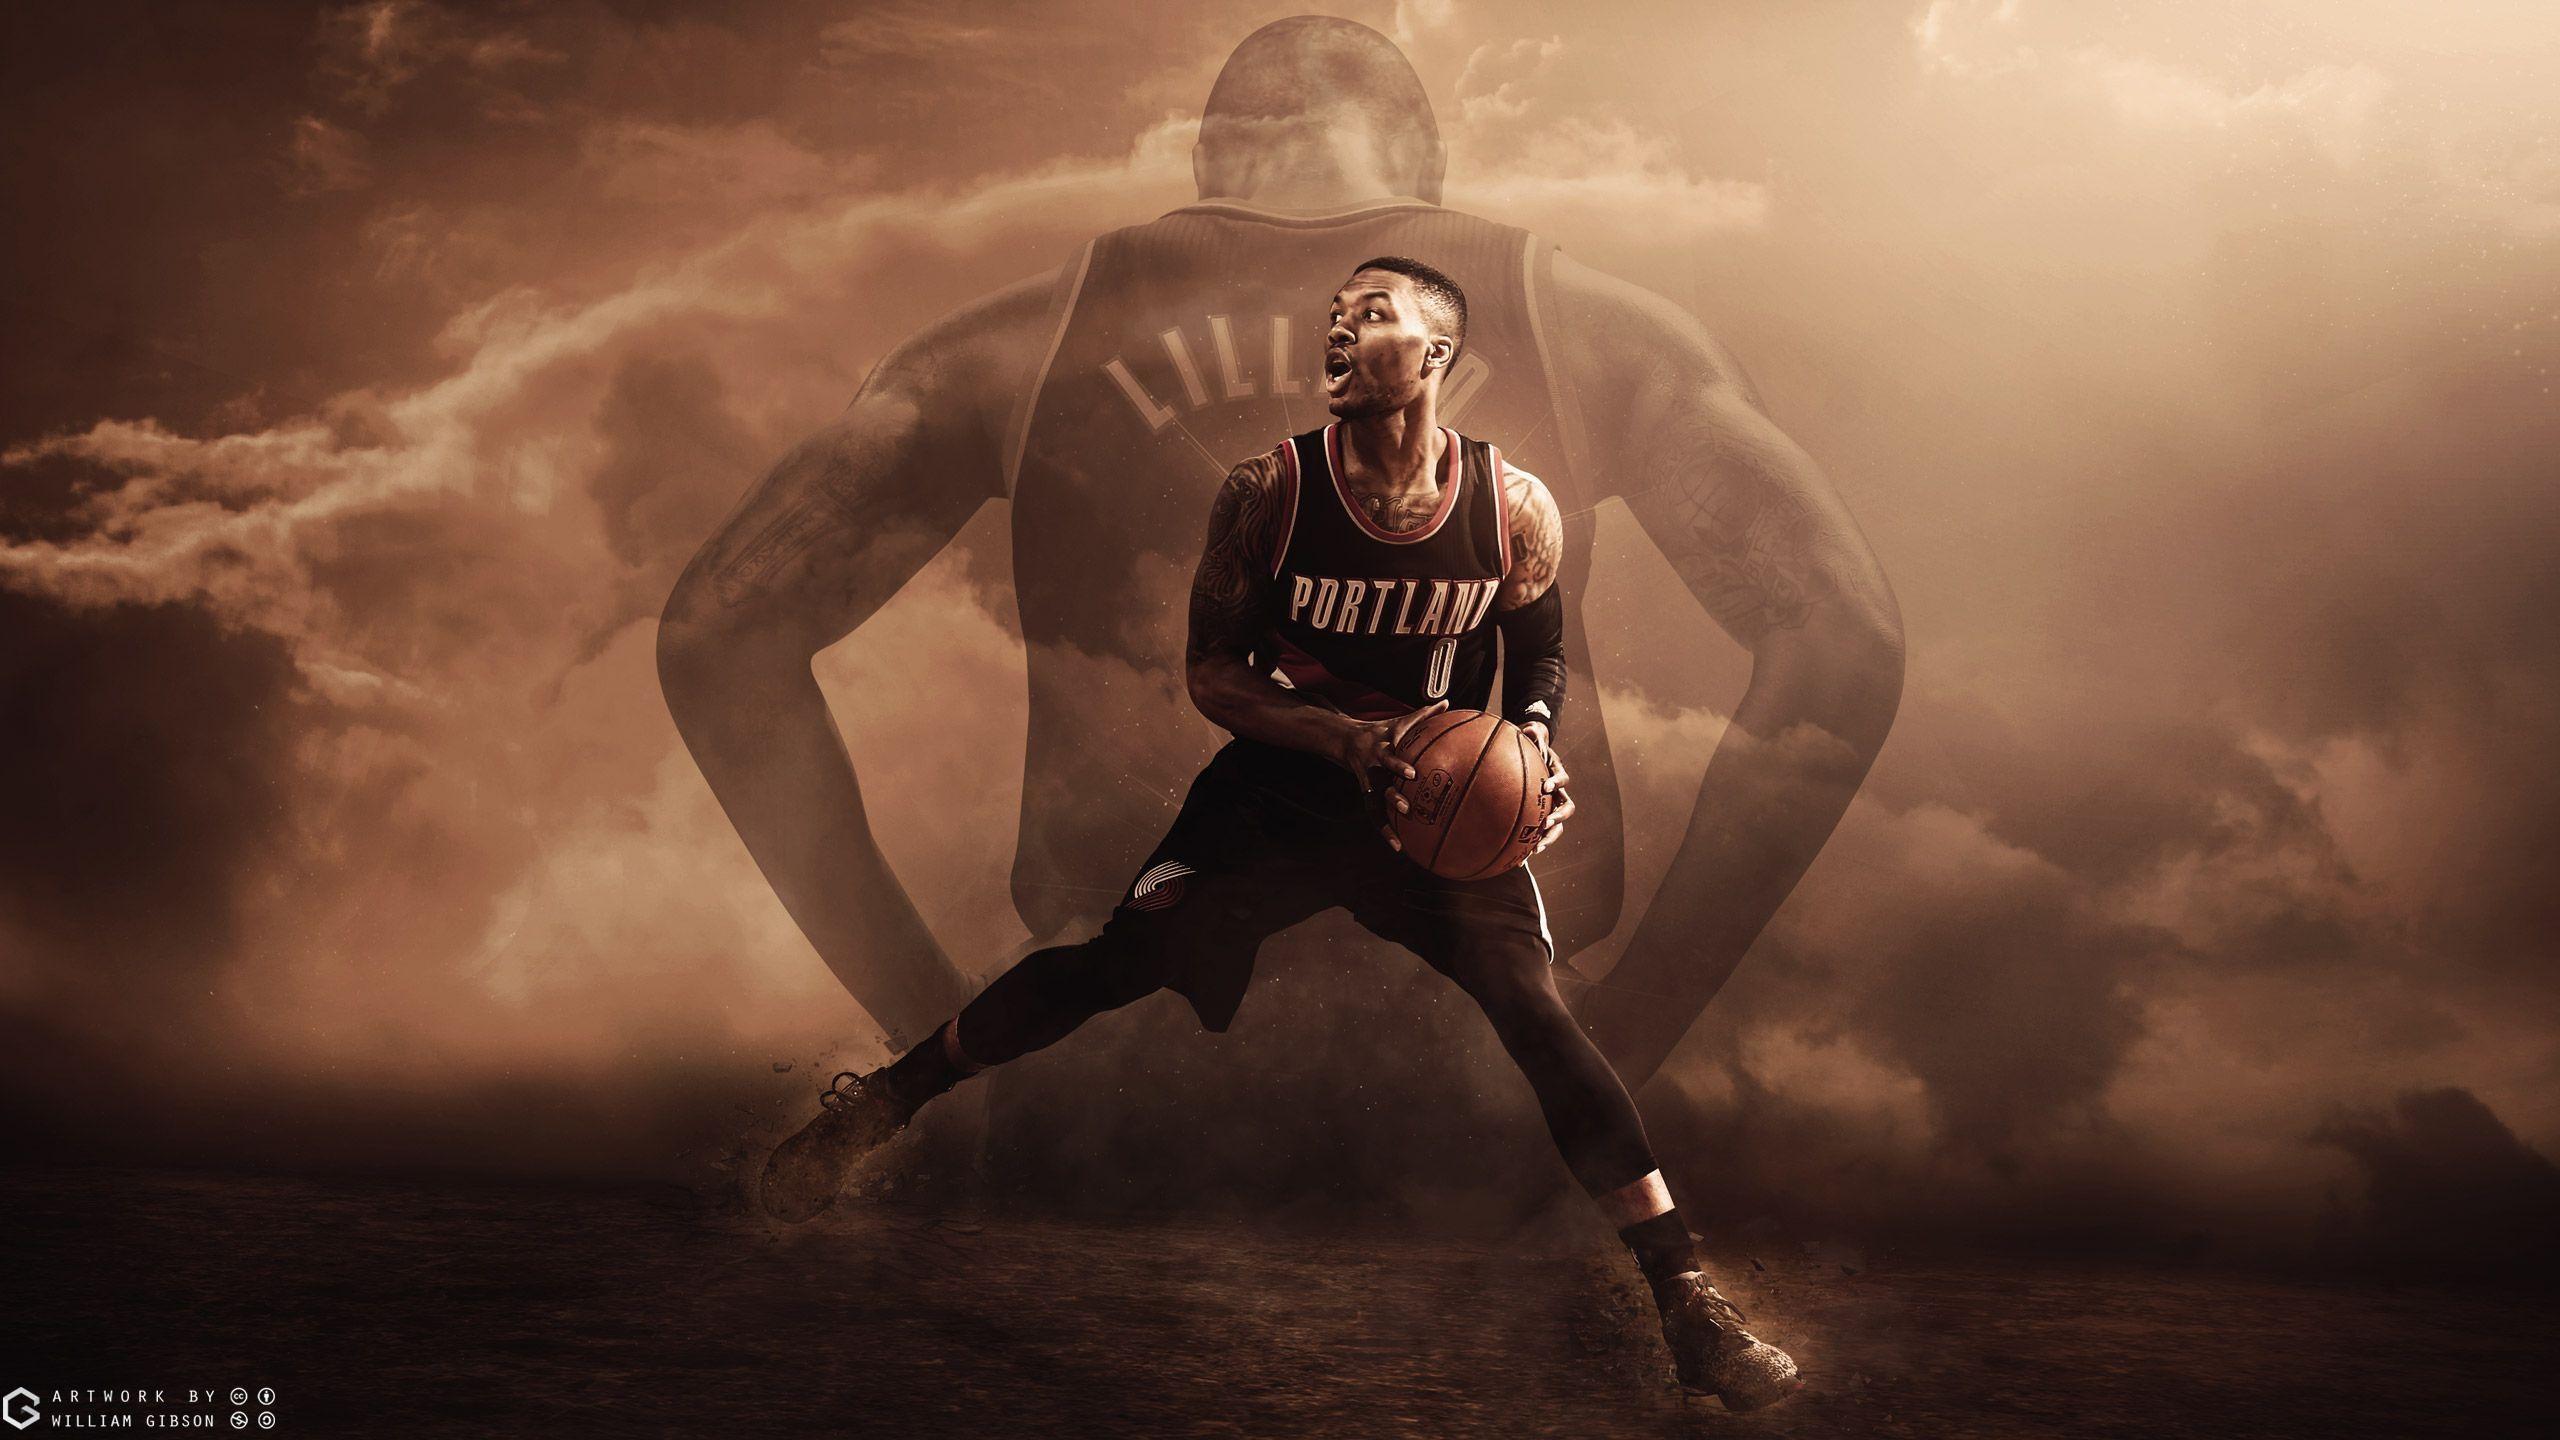 NBA Wallpapers 2016 – Wallpaper Cave